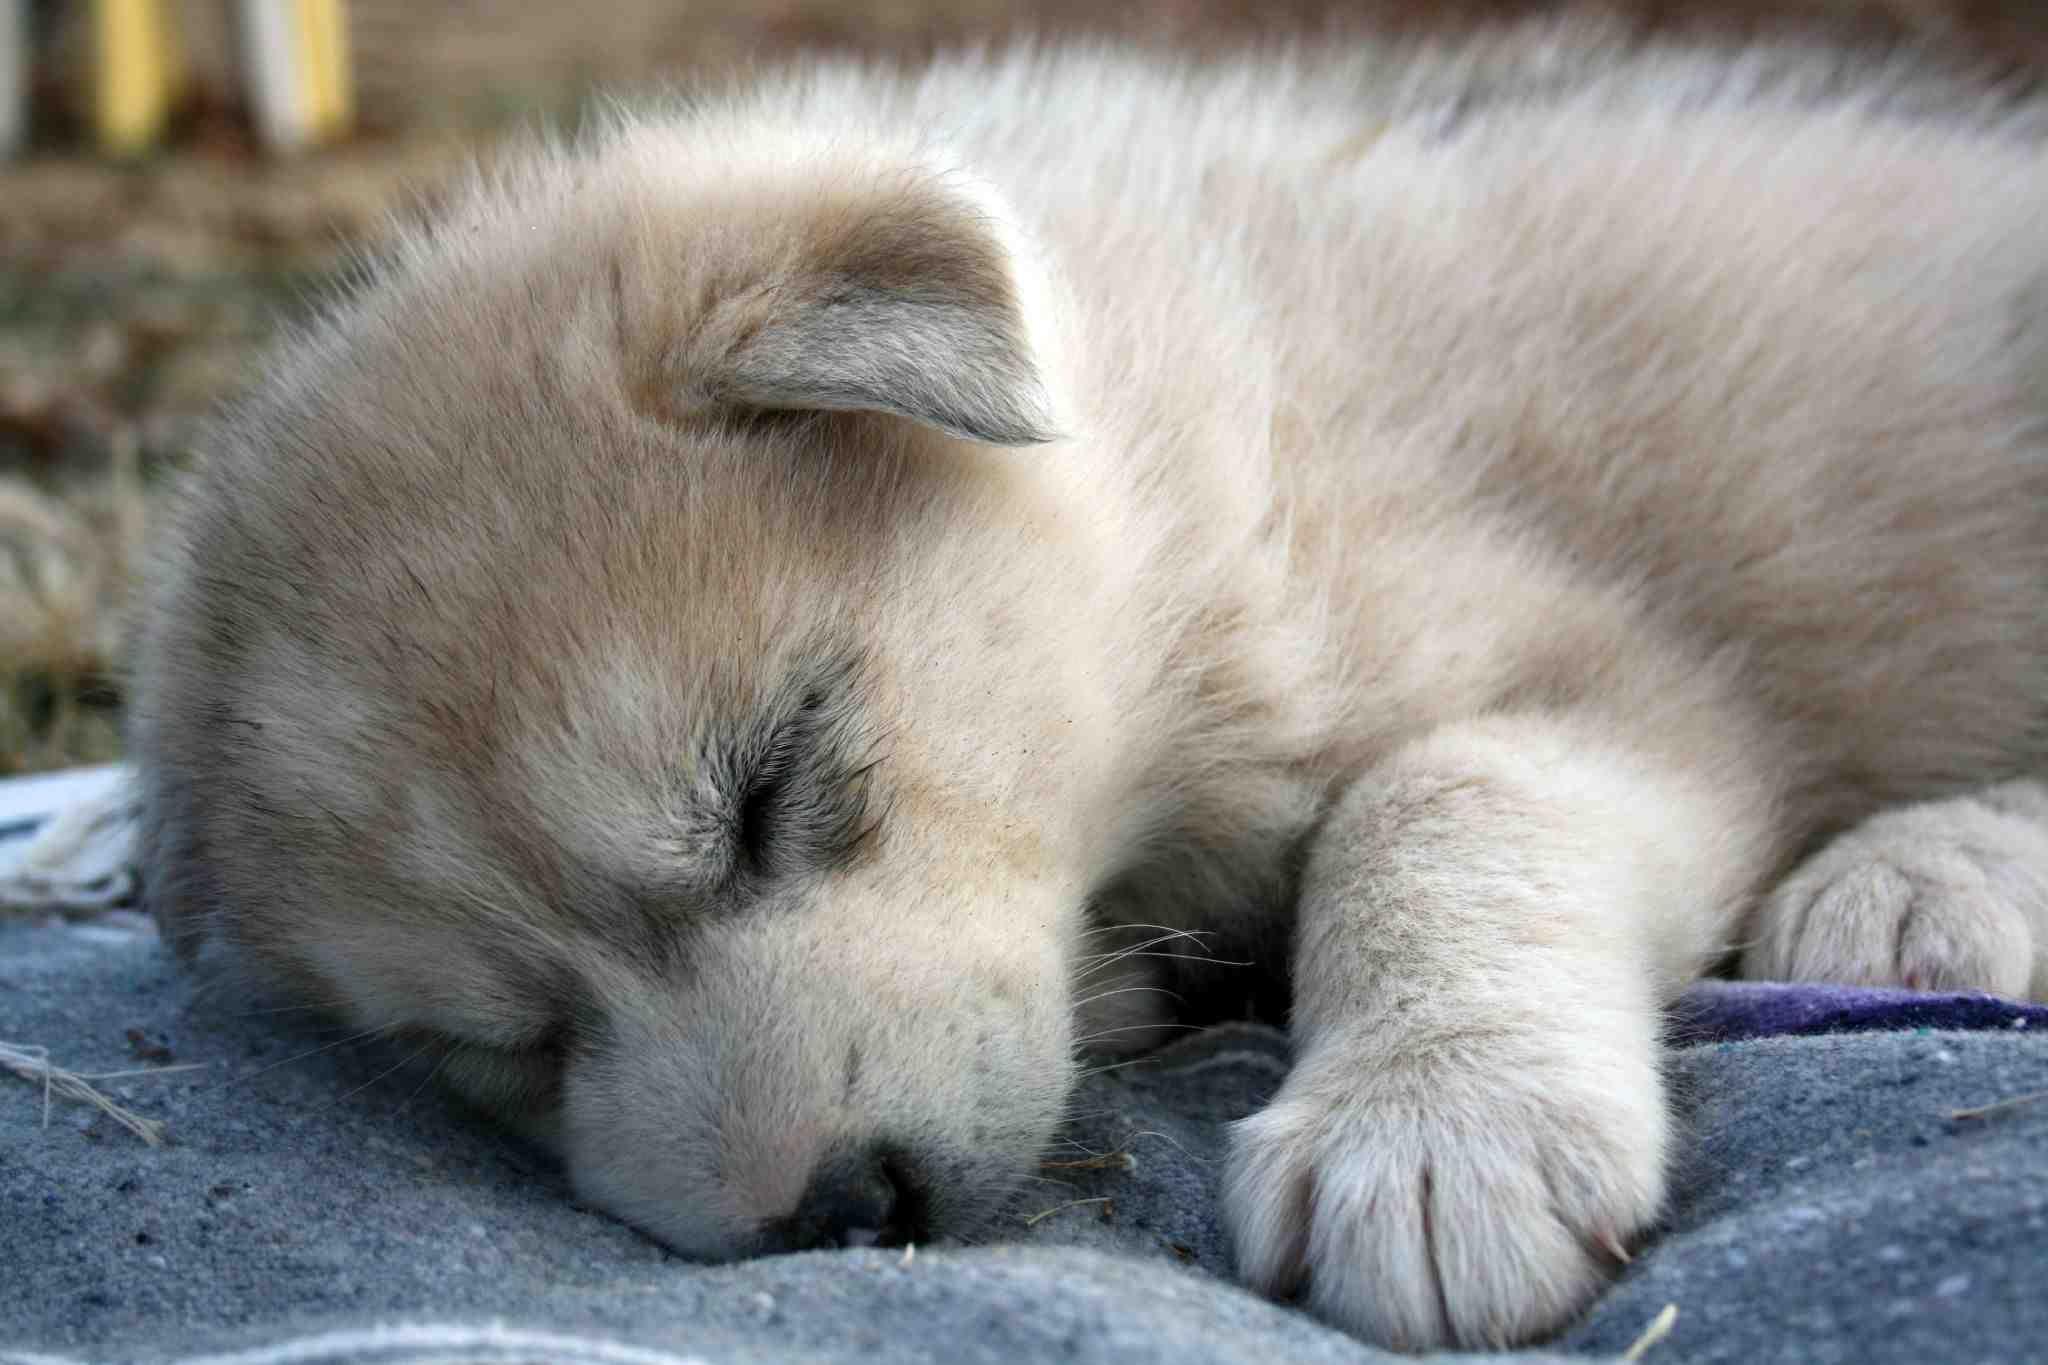 tundra-wolf-cub-209902 | Animals! | Pinterest | Animals and pets ...